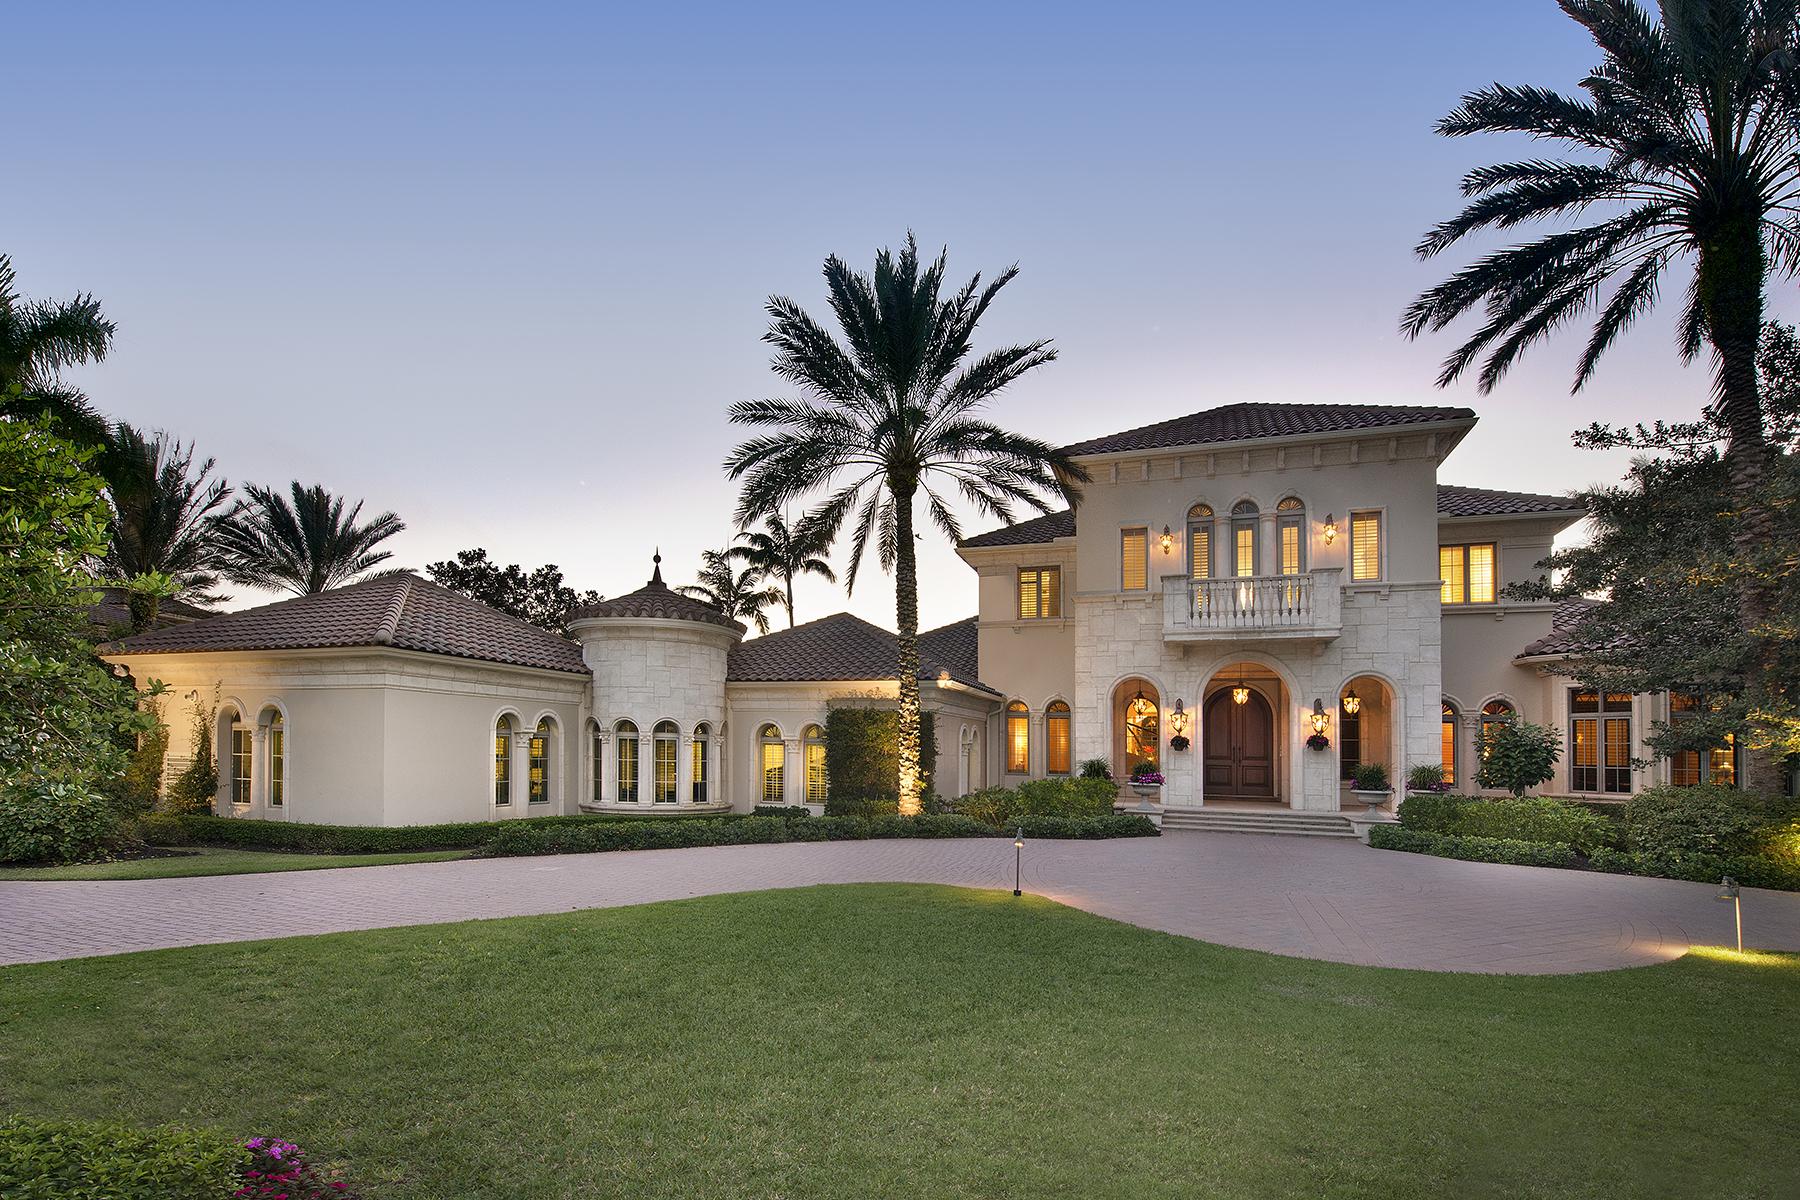 Villa per Vendita alle ore Estuary at Grey Oaks 1397 Great Egret Trl Estuary At Grey Oaks, Naples, Florida, 34105 Stati Uniti